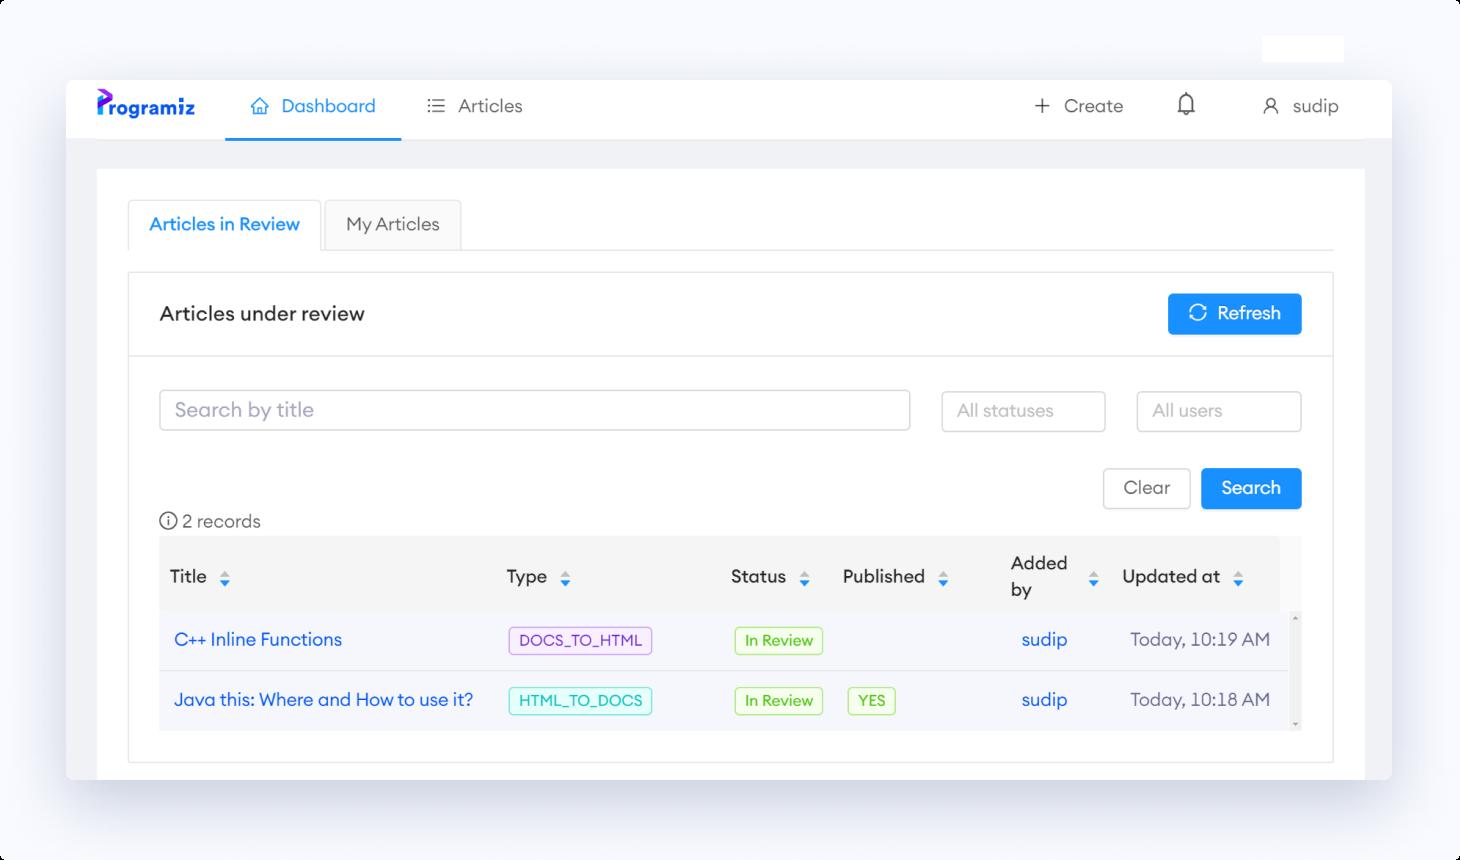 Programiz inhouse content workflow system